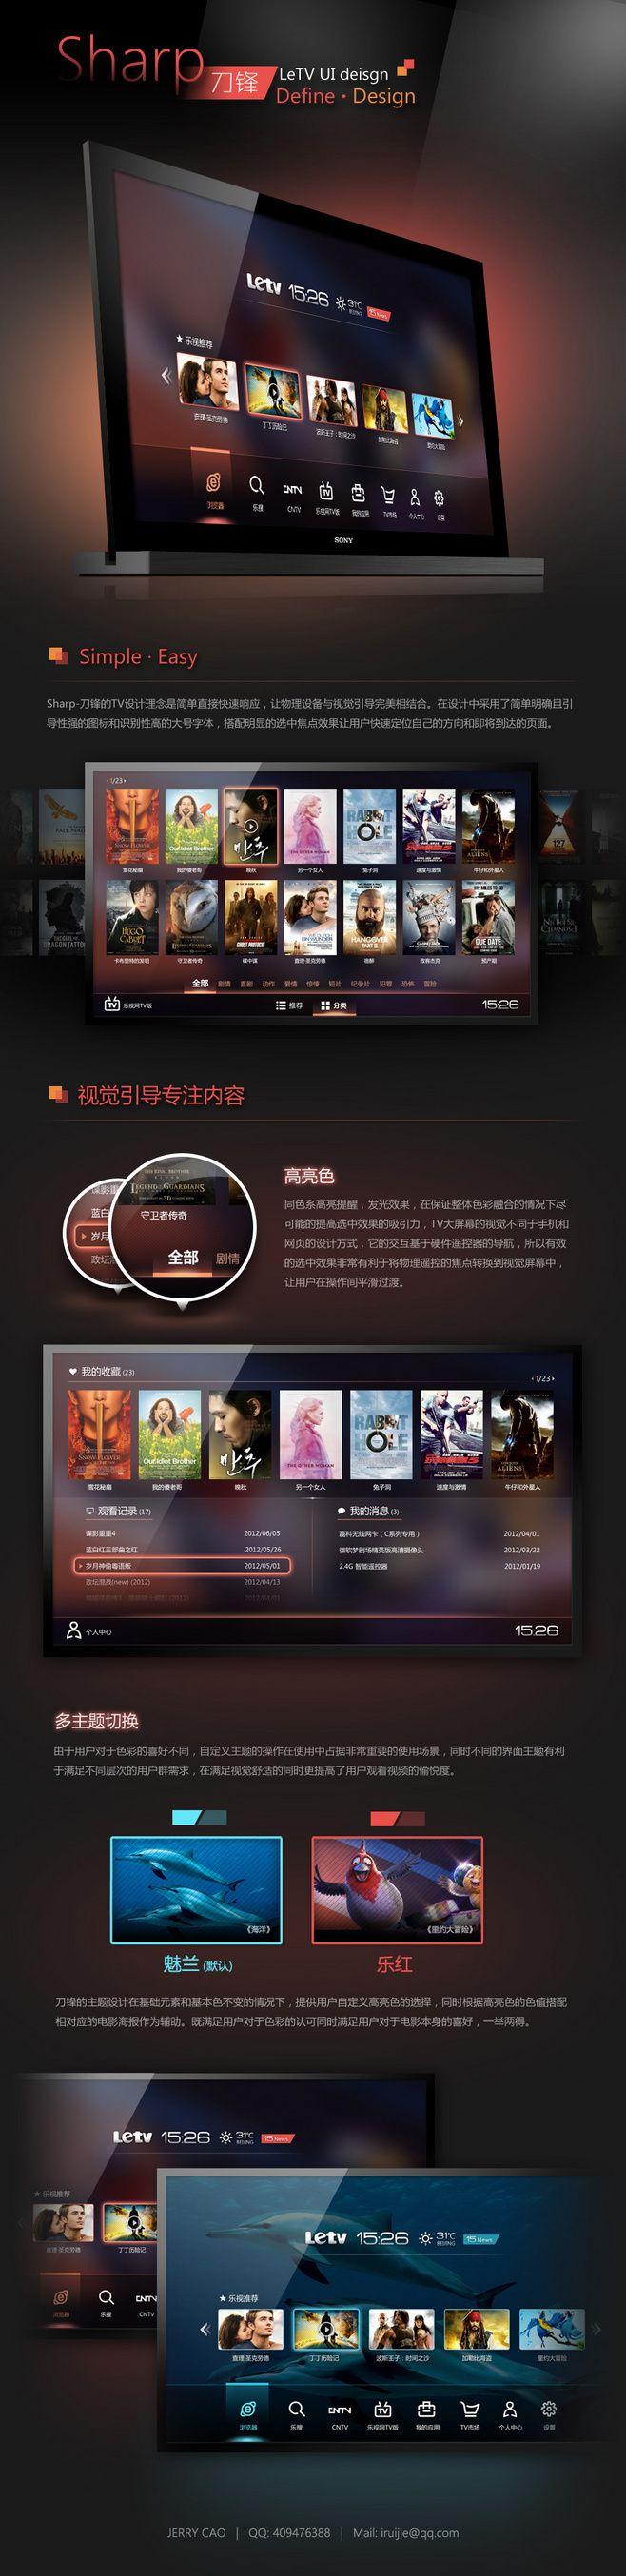 Sharp-刀锋 LeTV UI Design